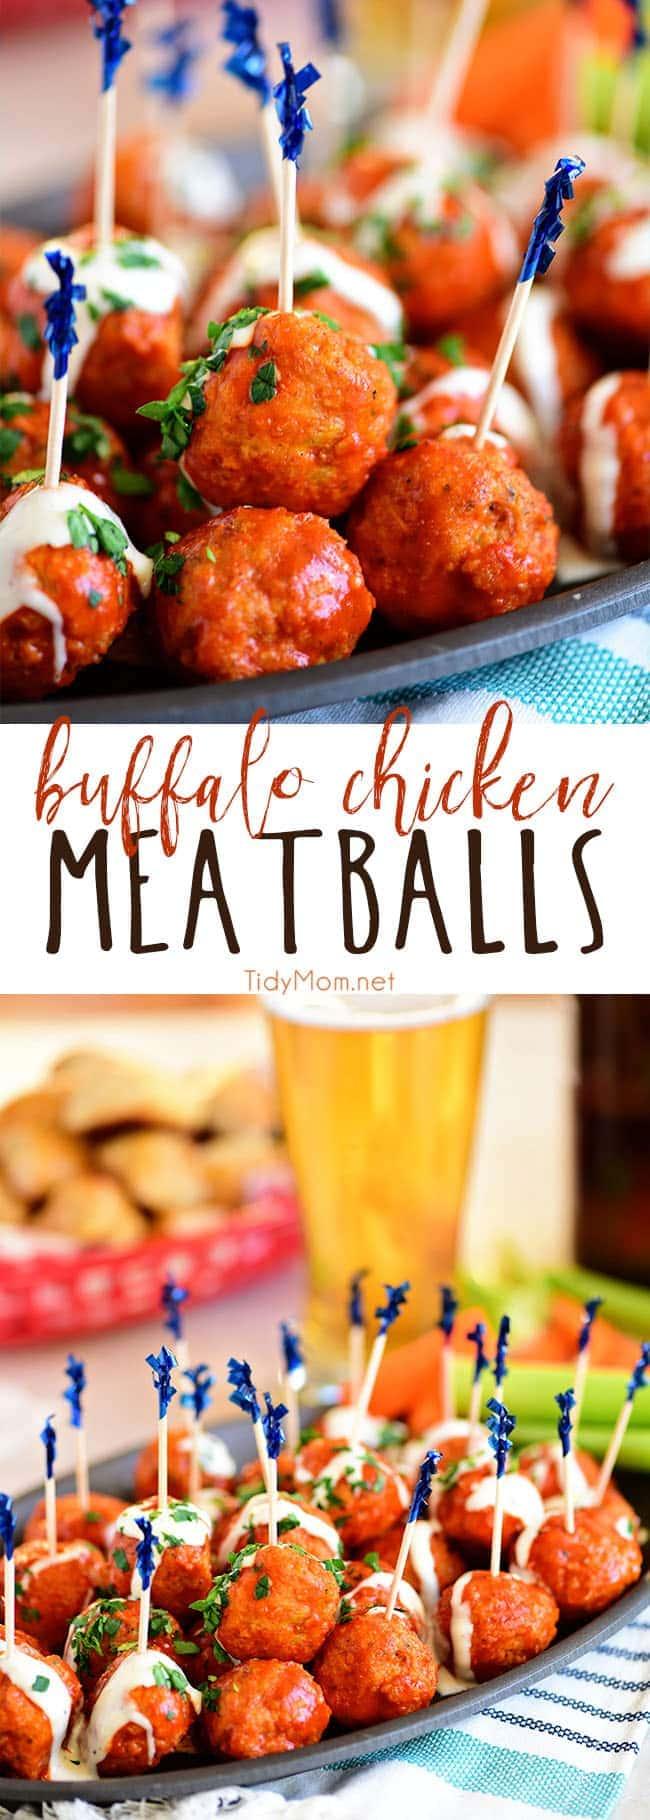 Buffalo Chicken Meatballs with Ranch tastes just like buffalo hot wings. Get the recipe at TidyMom.net #meatballs #buffalochicken #appetizer